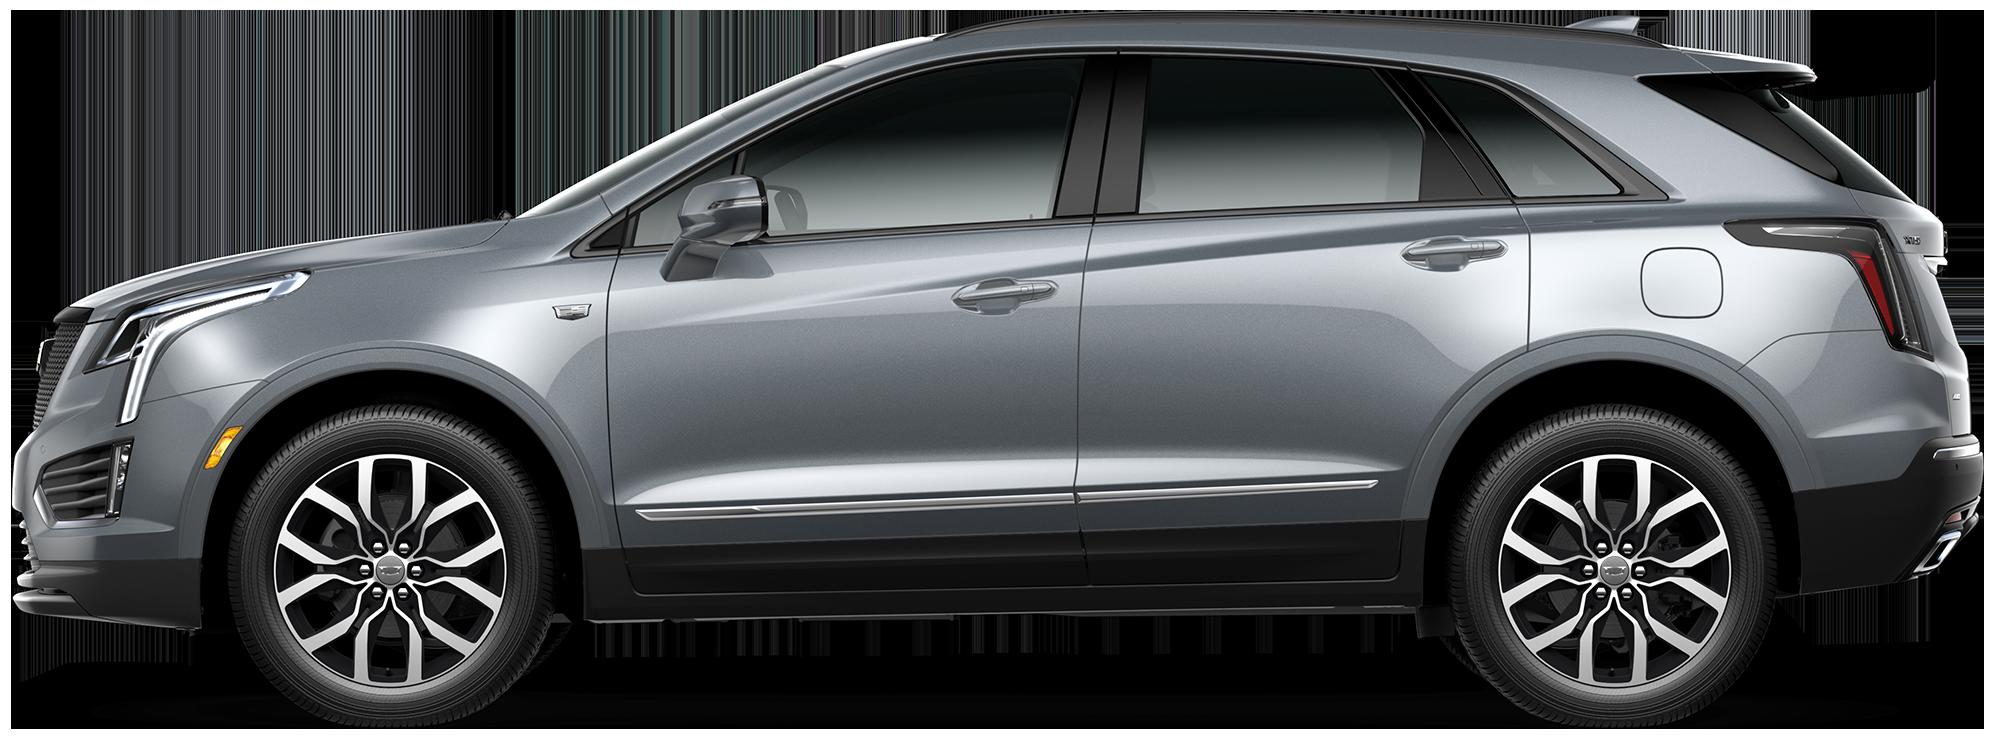 2022 CADILLAC XT5 SUV Sport